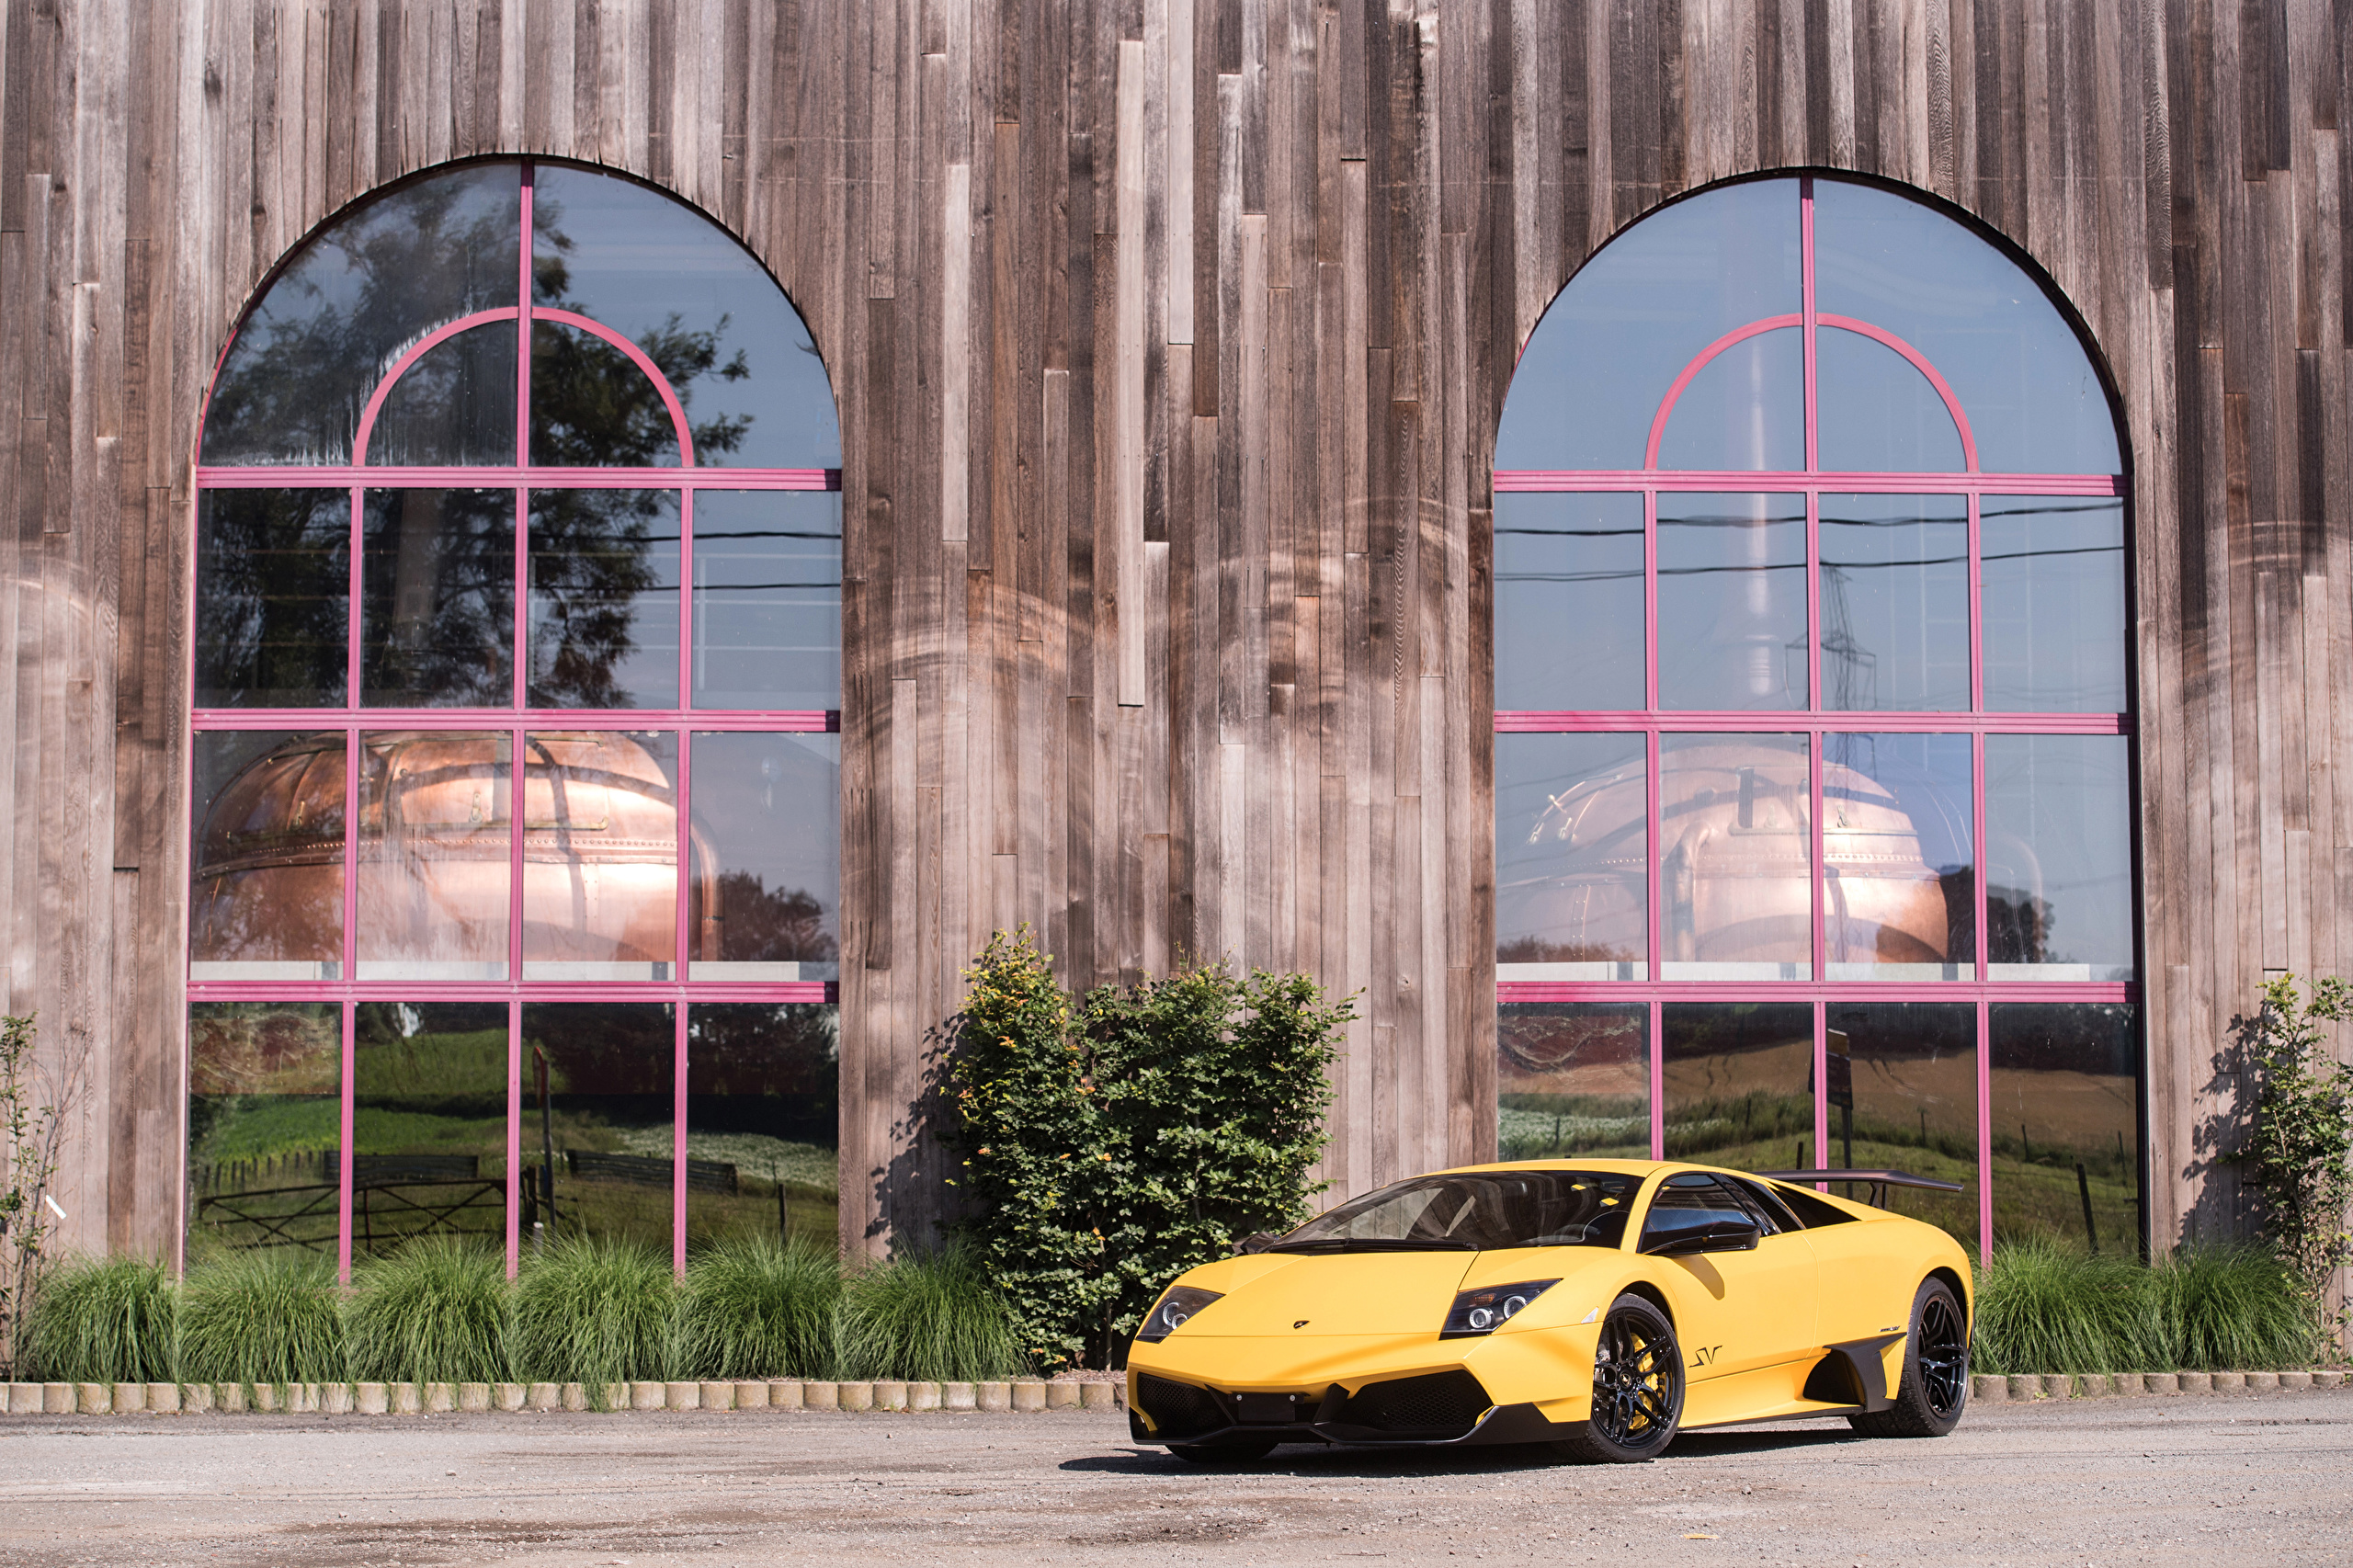 Картинки 2009-10 Lamborghini Murciélago LP 670-4 SuperVeloce Worldwide Желтый Автомобили 2560x1706 Ламборгини желтых желтые желтая авто машина машины автомобиль